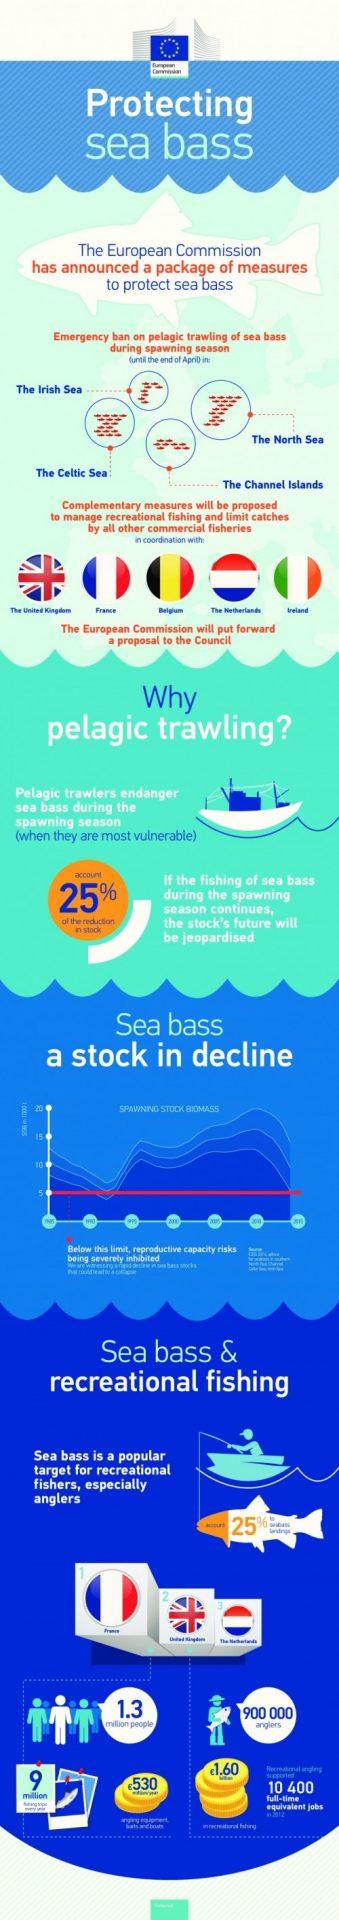 2015-seabass-facts_en